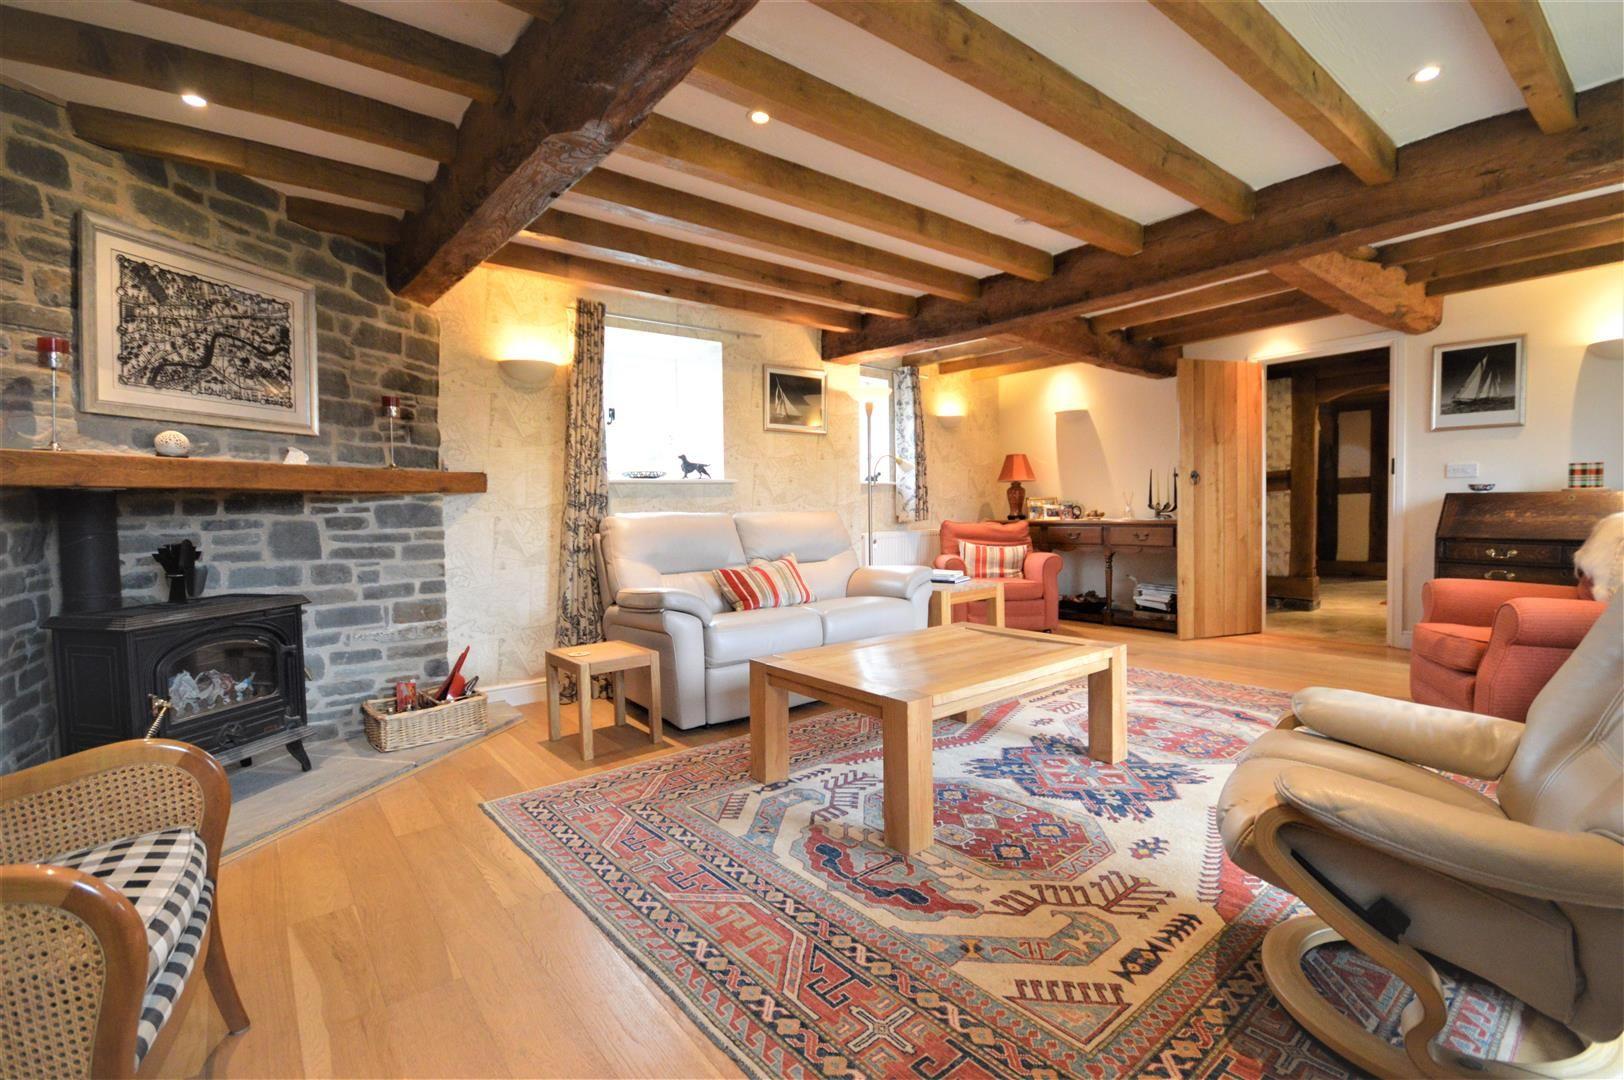 4 bed barn conversion for sale in Kingsland  - Property Image 2